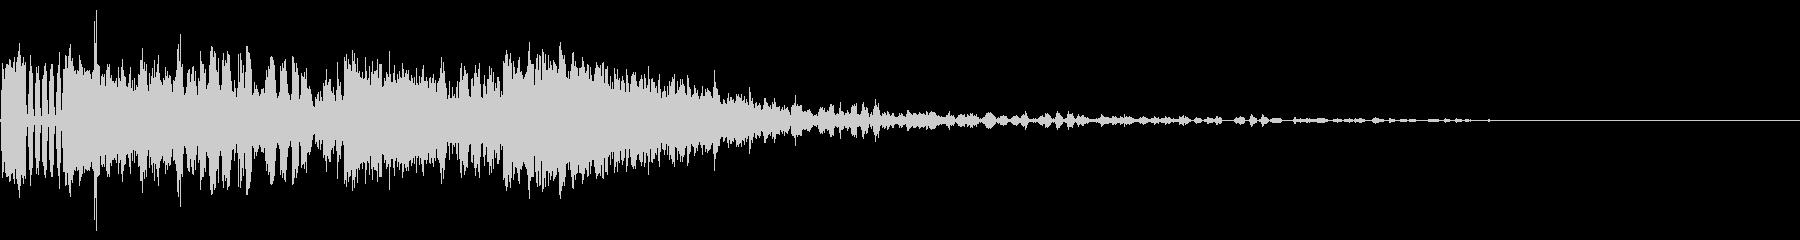 242 FX爆発音(2)の未再生の波形